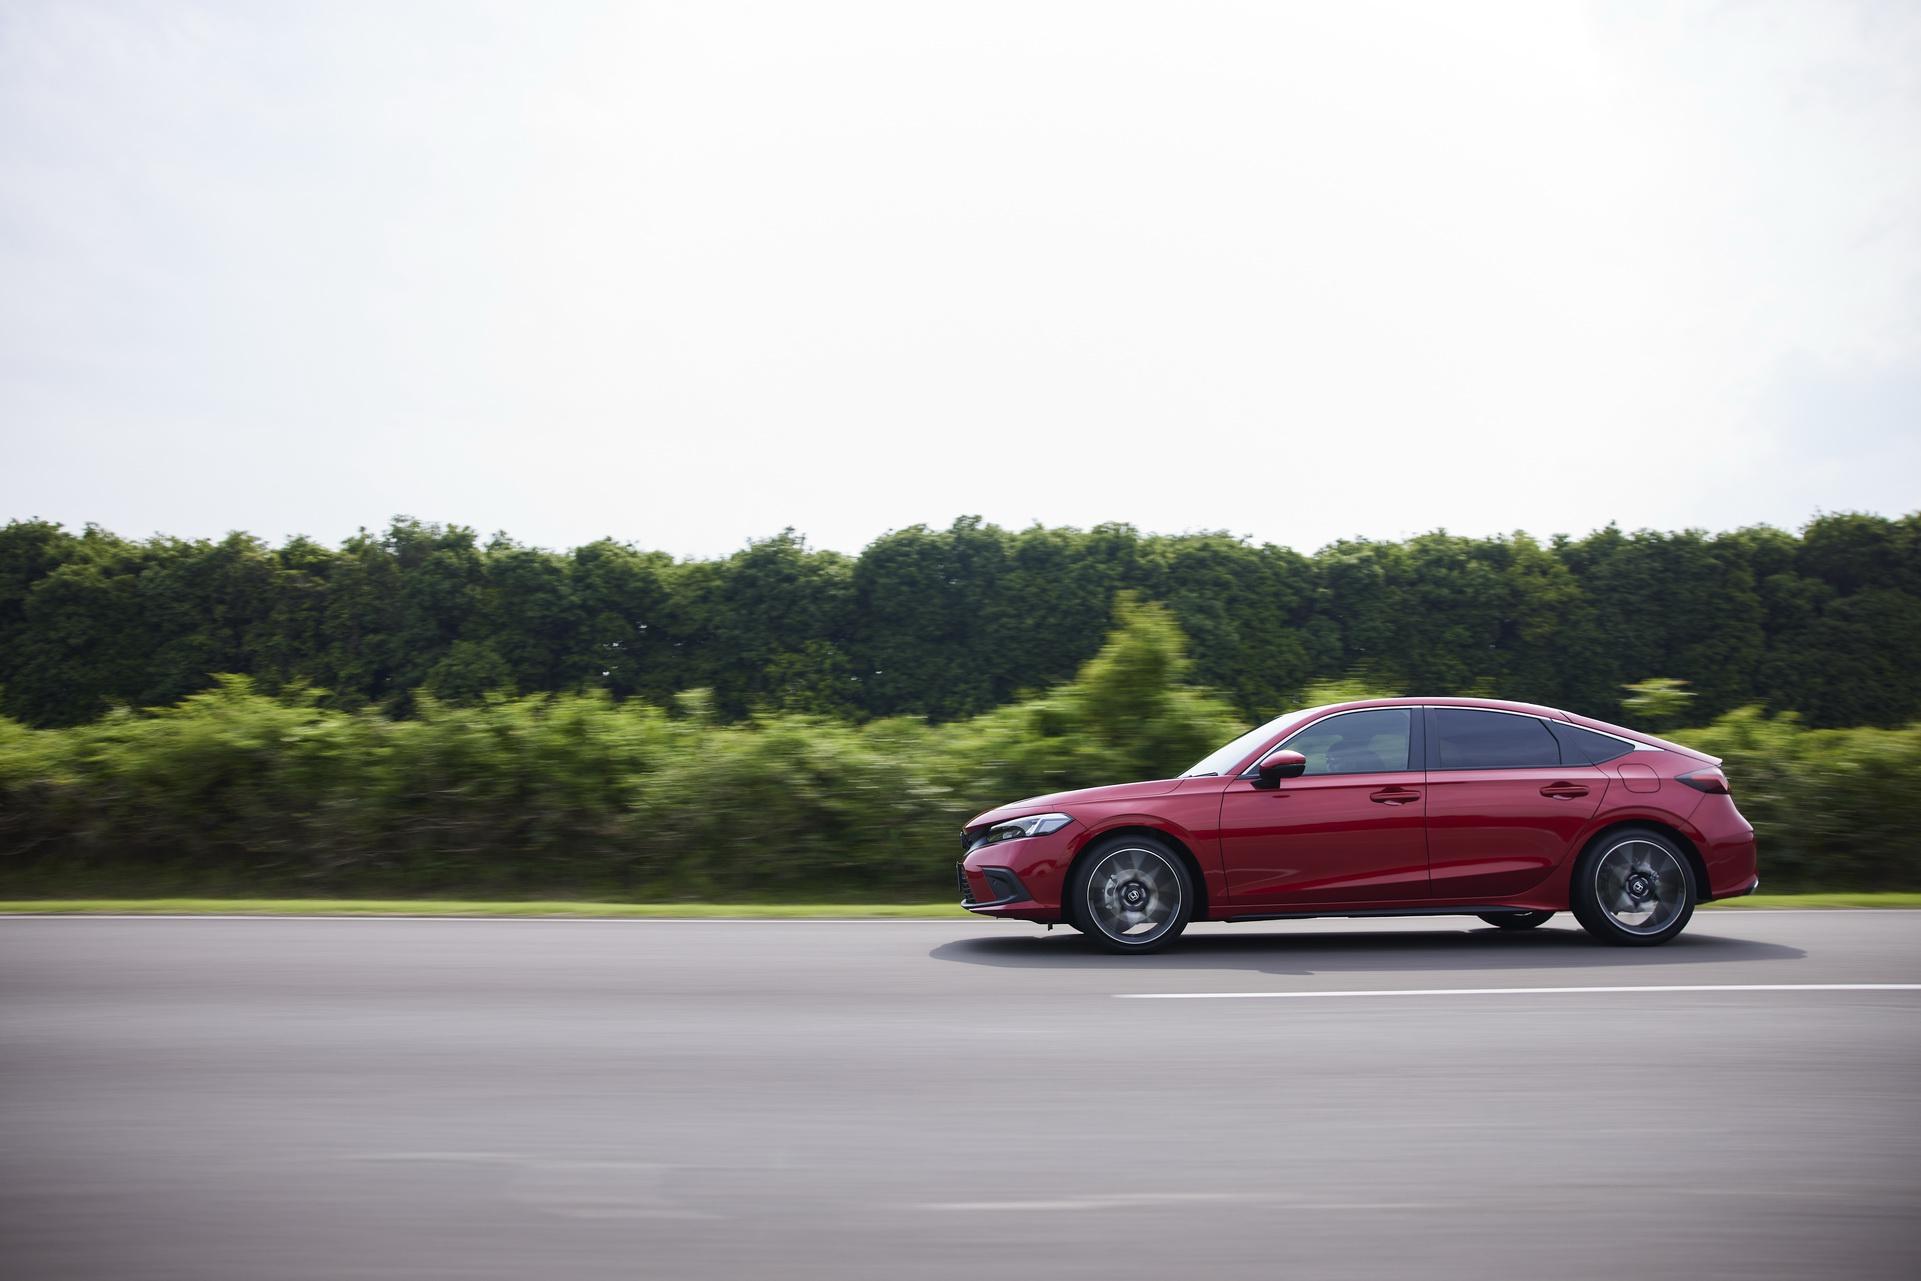 Honda-Civic-hatchback-15